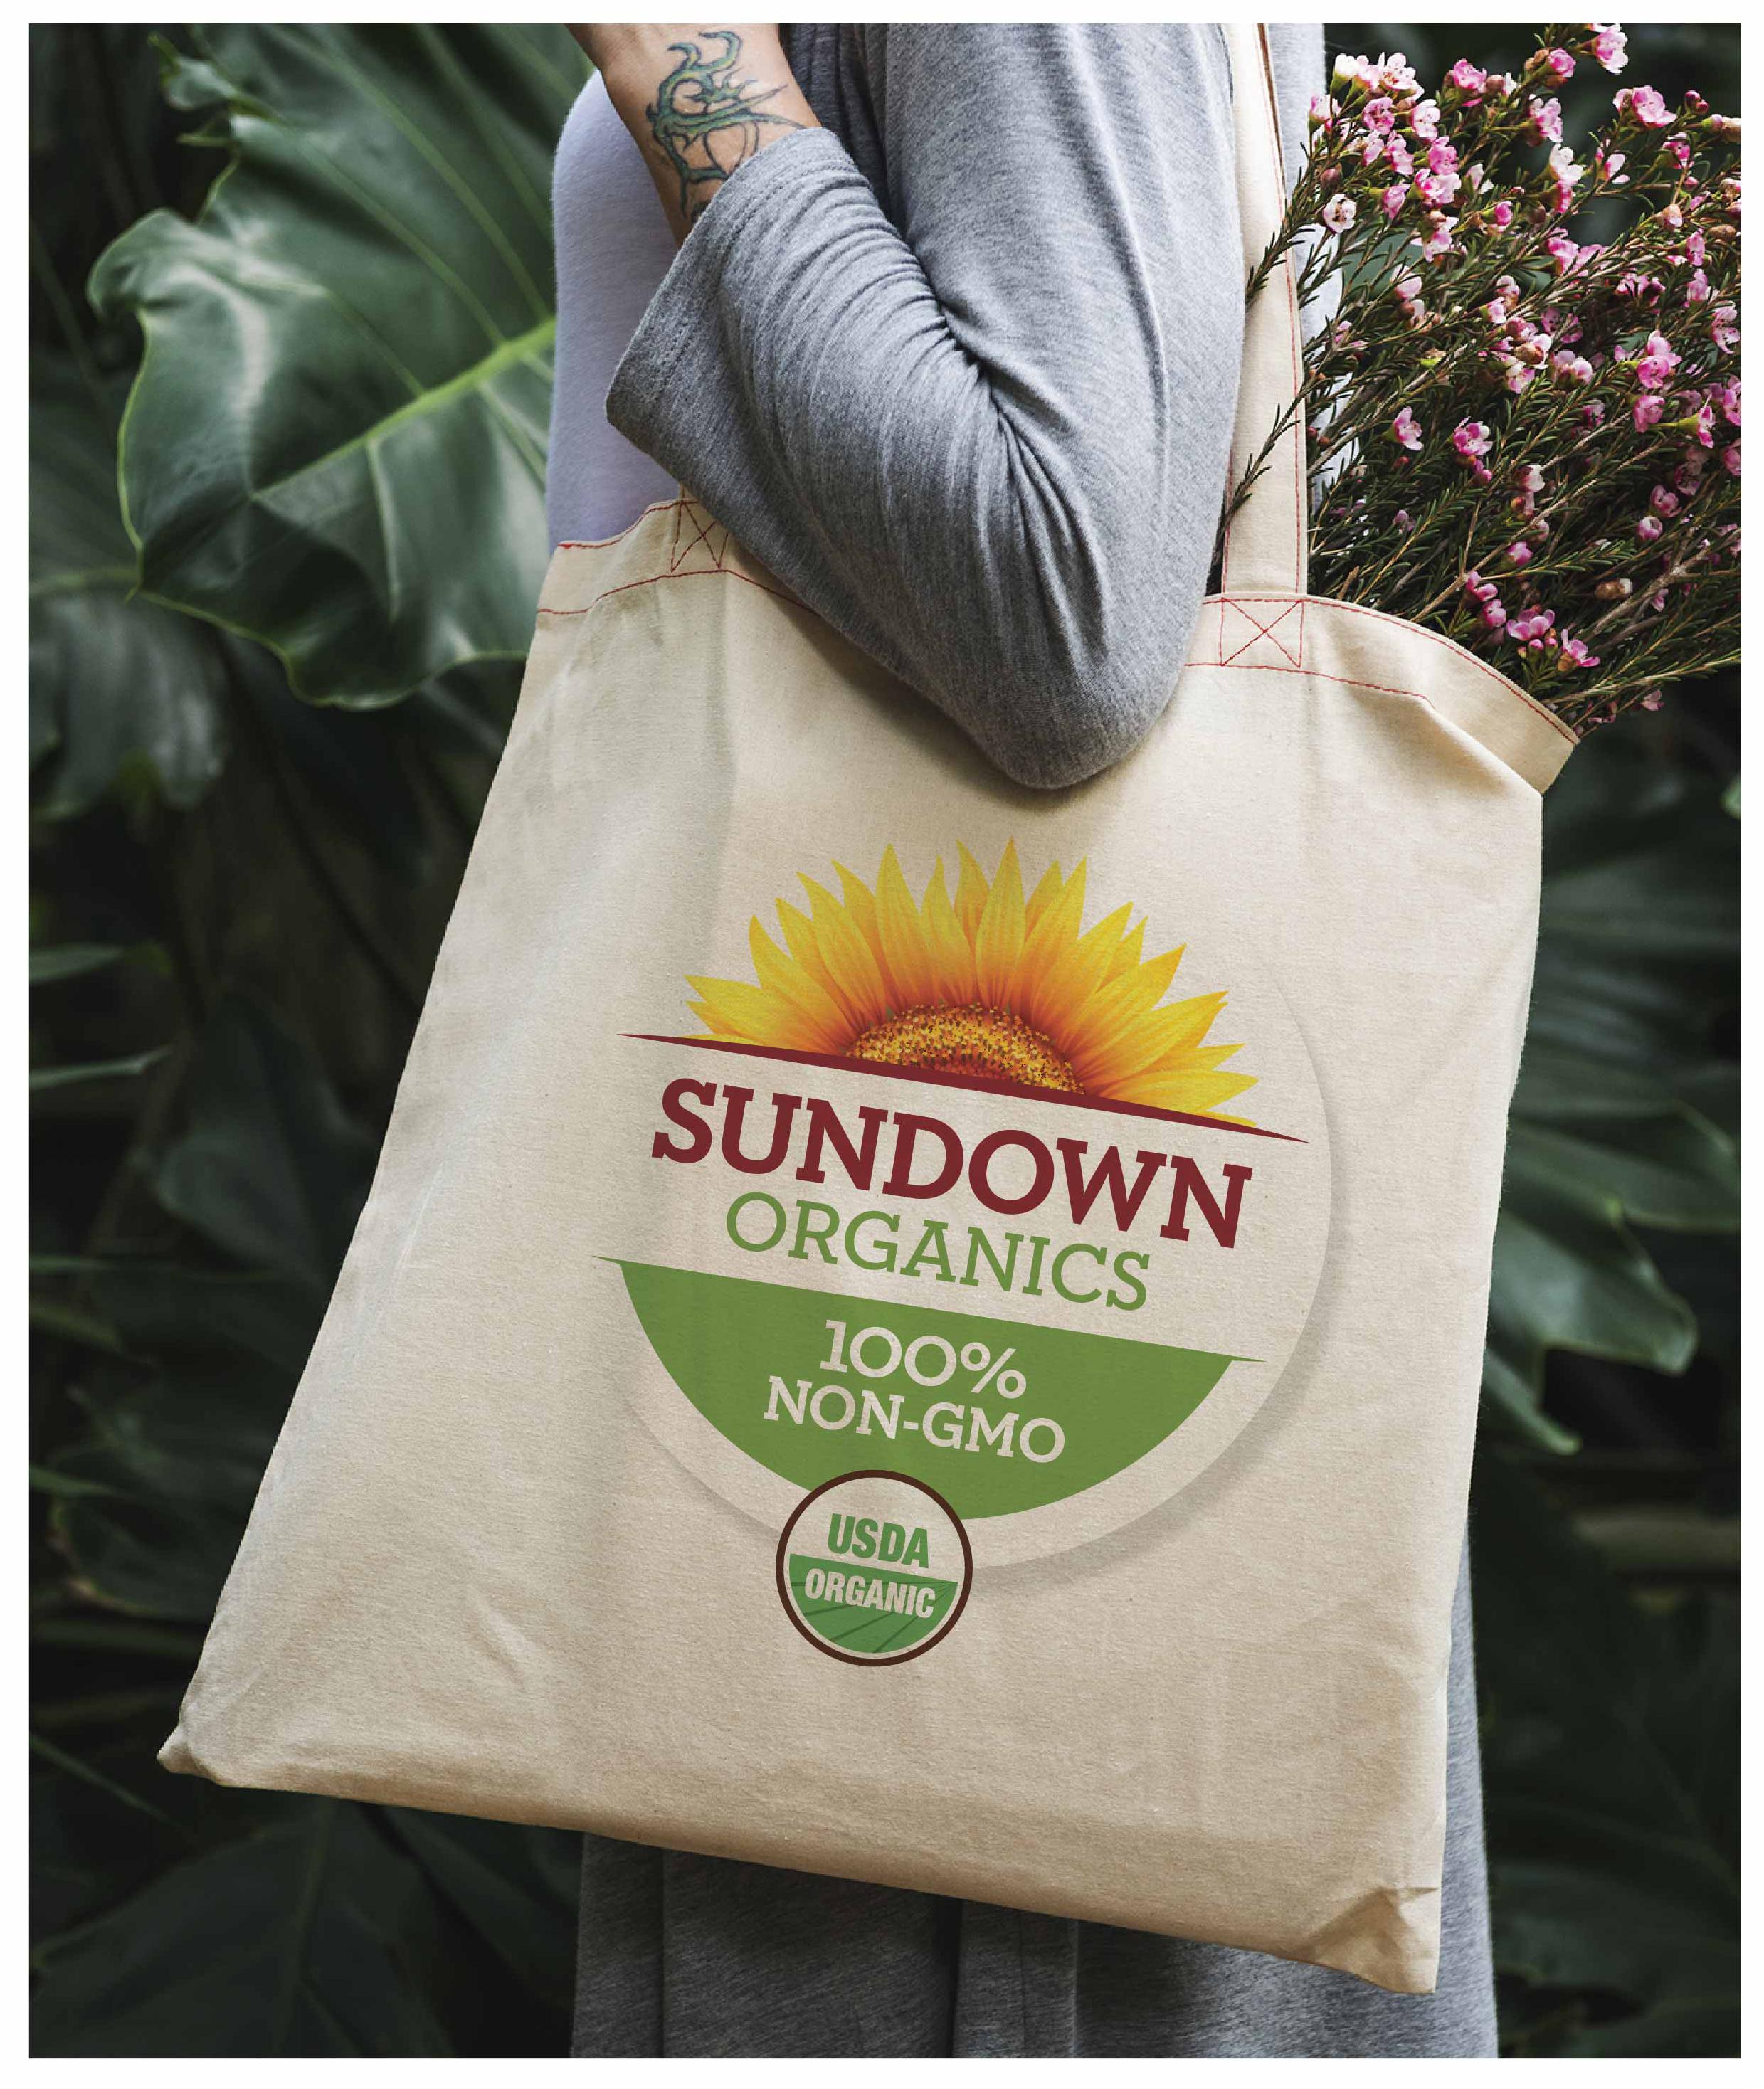 SundownClean-Organics_Bag.jpg